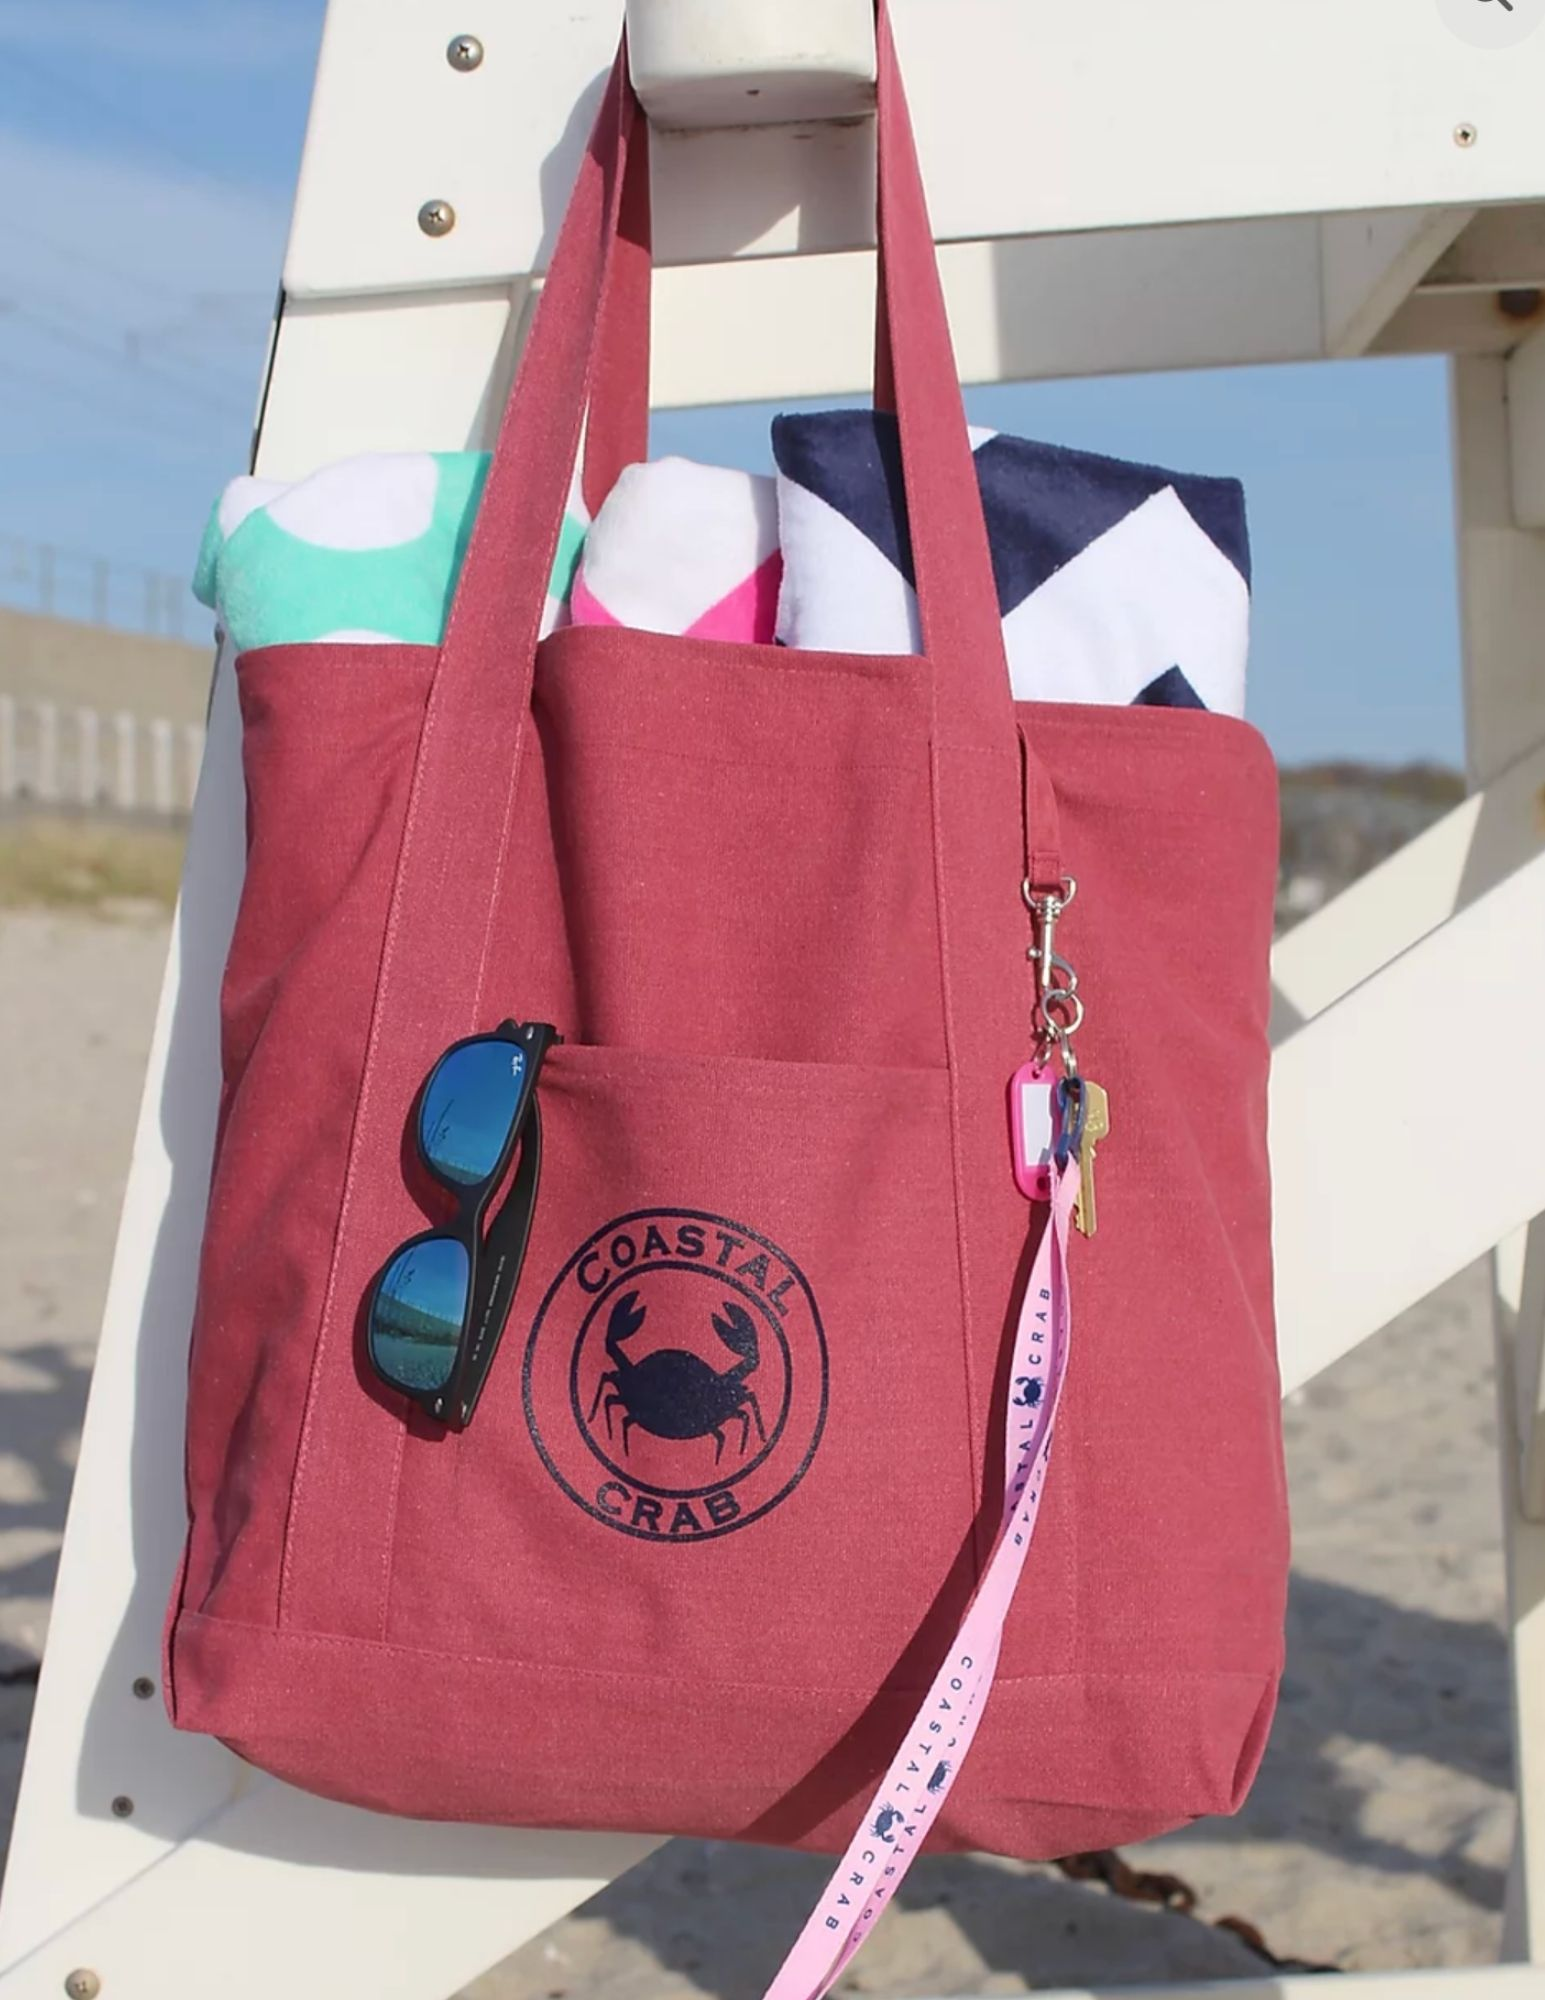 Coastal Crab CT Coastal Gifts on Main Niantic-12